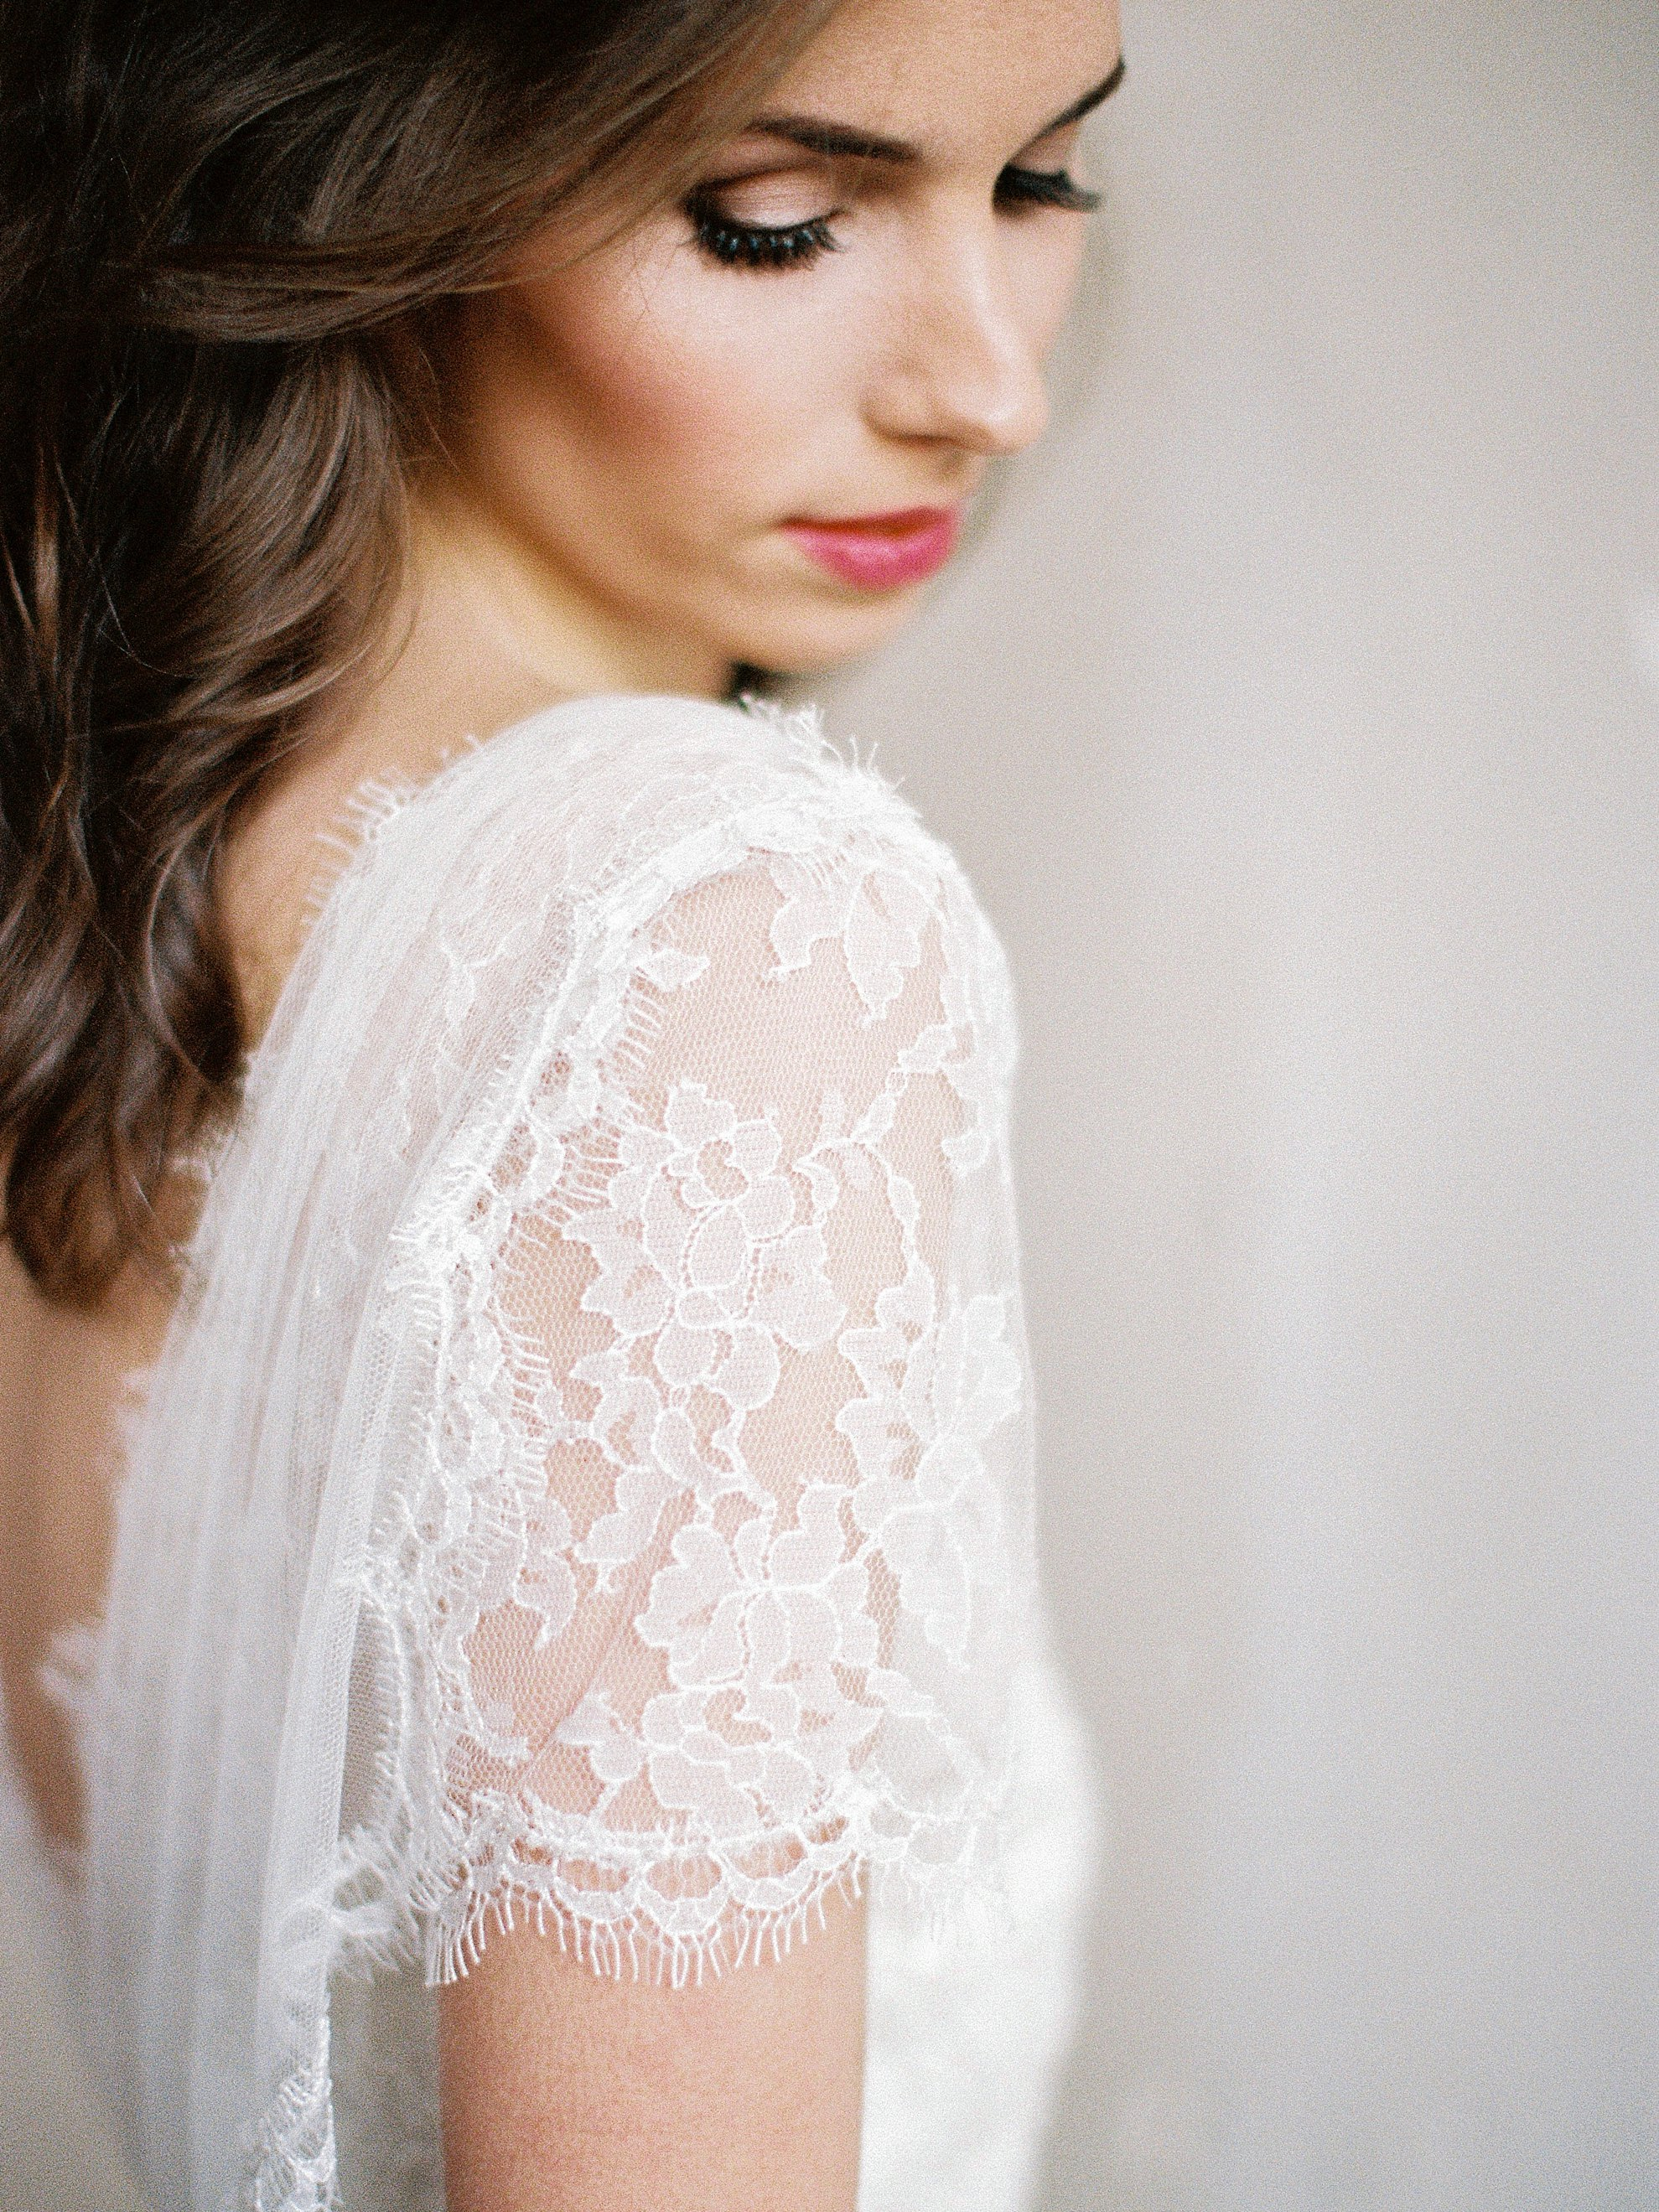 Amanda-Drost-fine-art-photography_0003.jpg